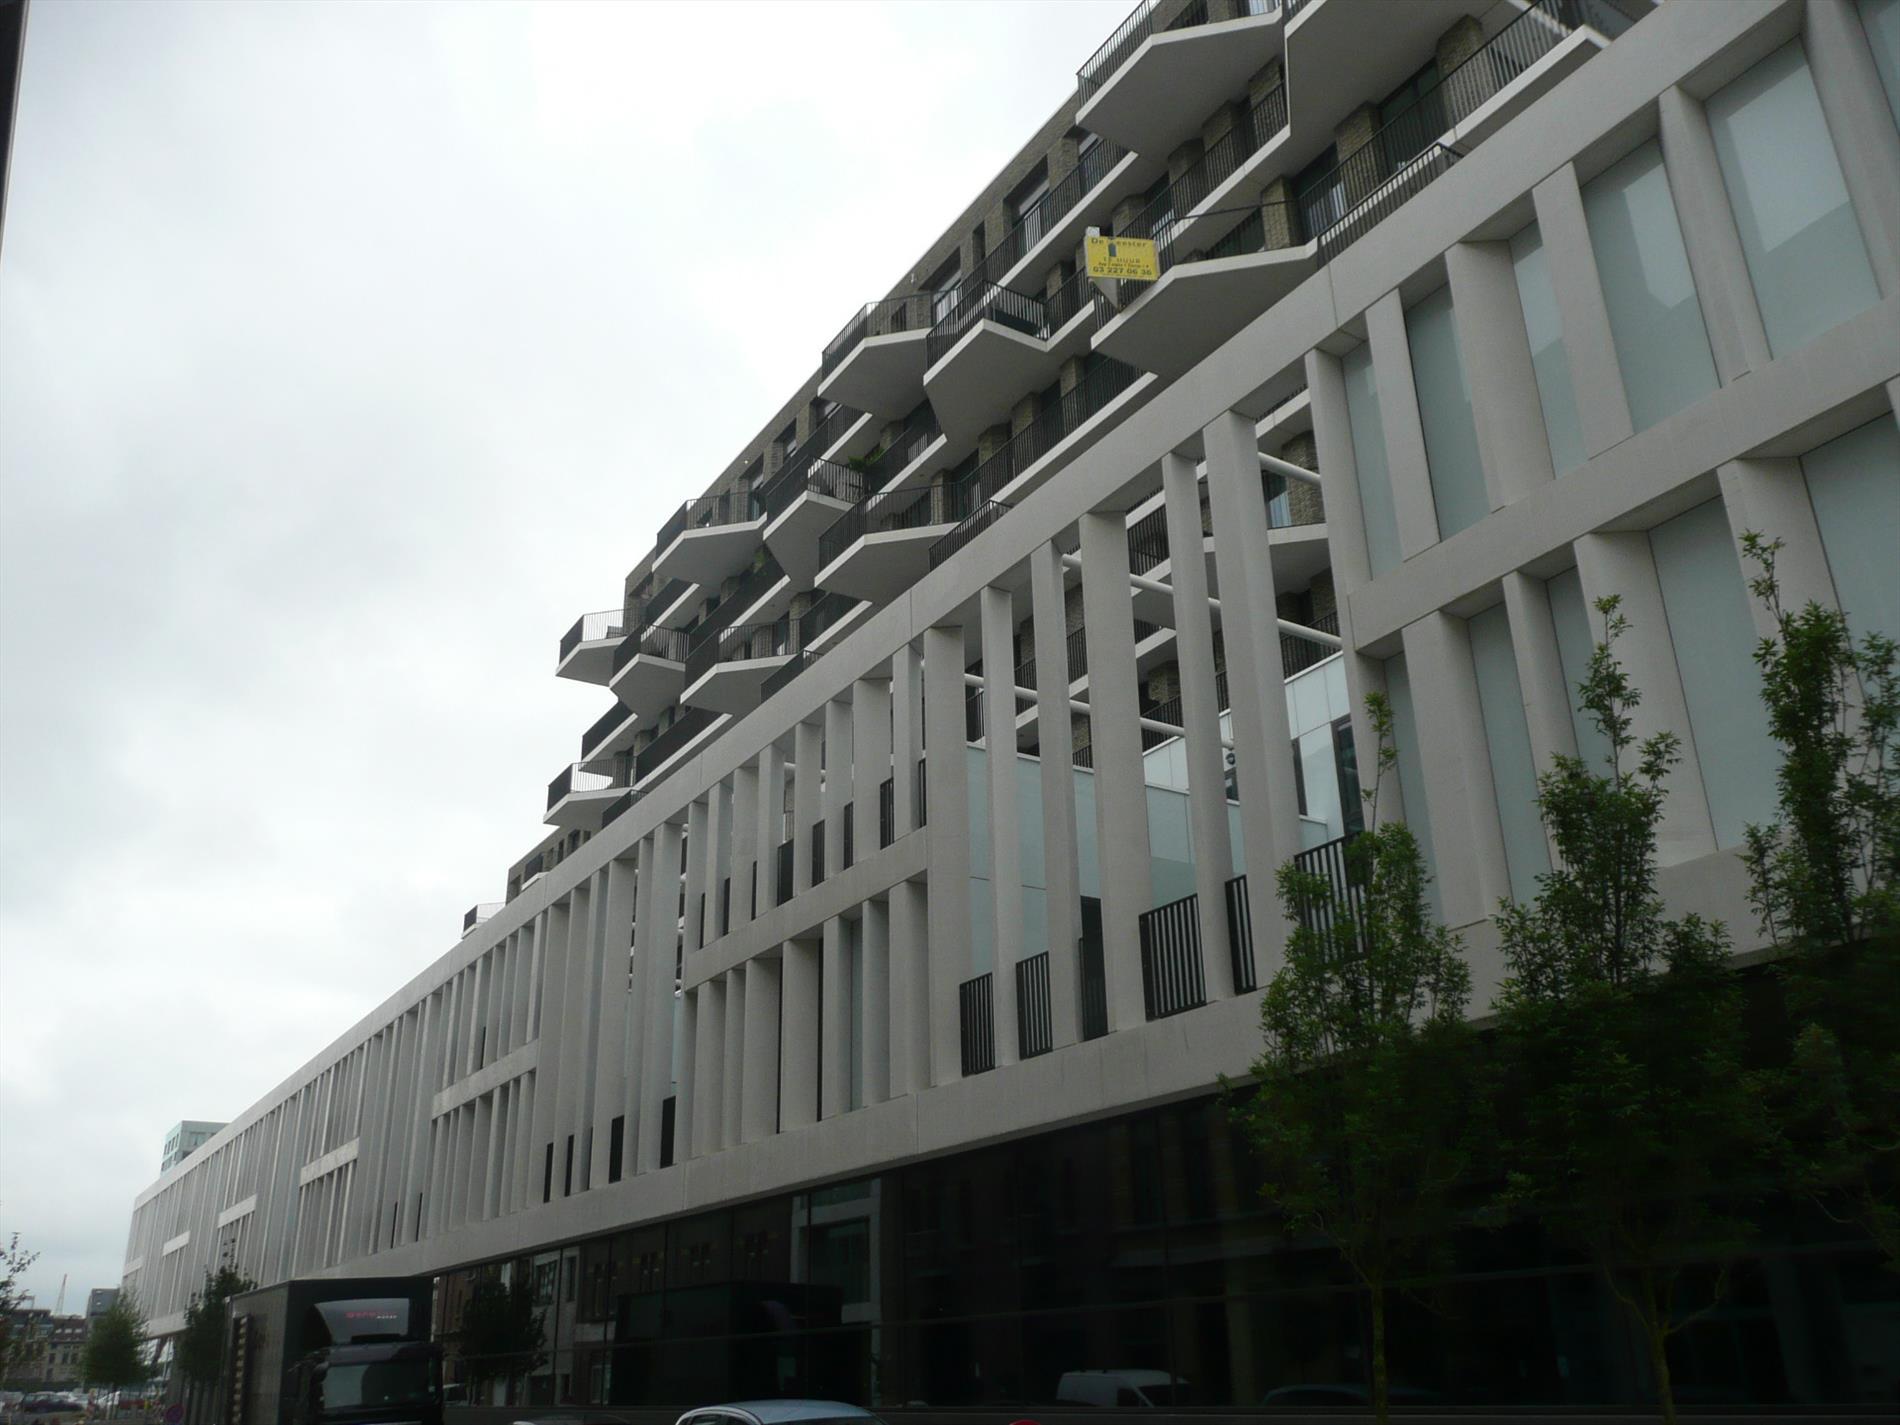 August Michielsstraat 7 Antwerpen